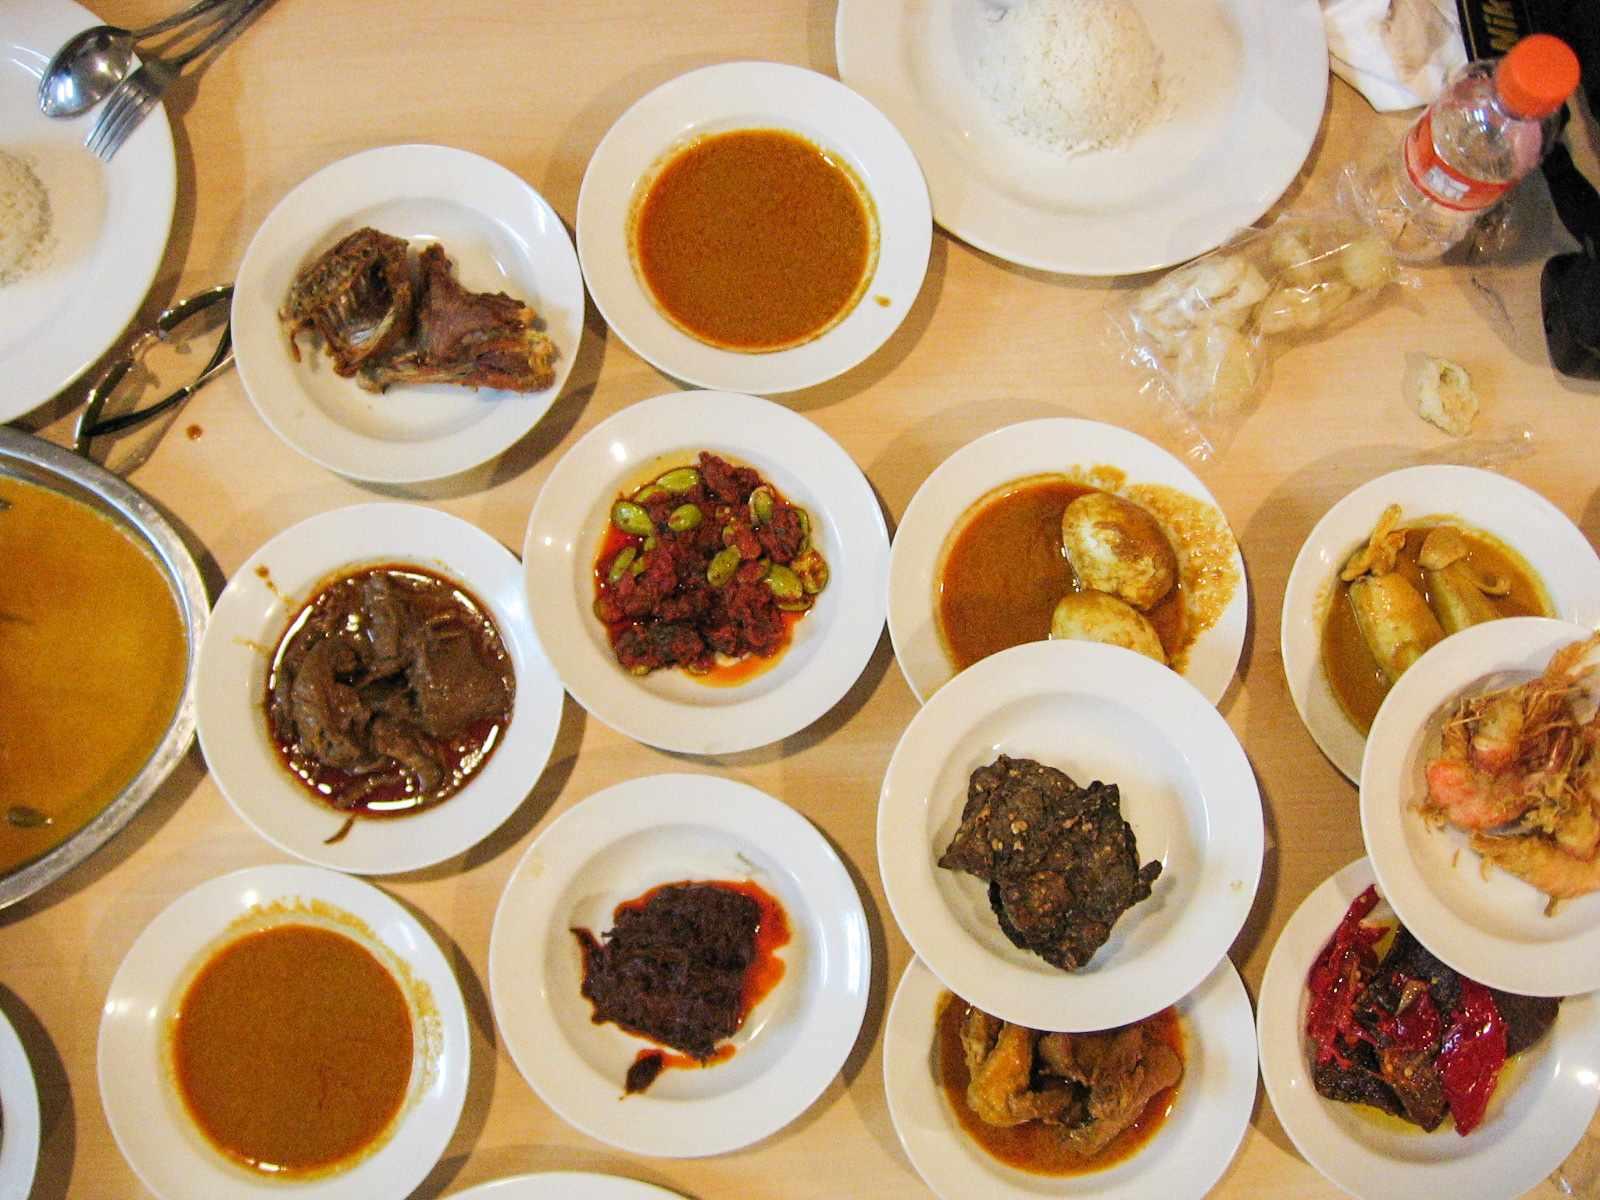 Padang food at Sari Bundo, Jakarta